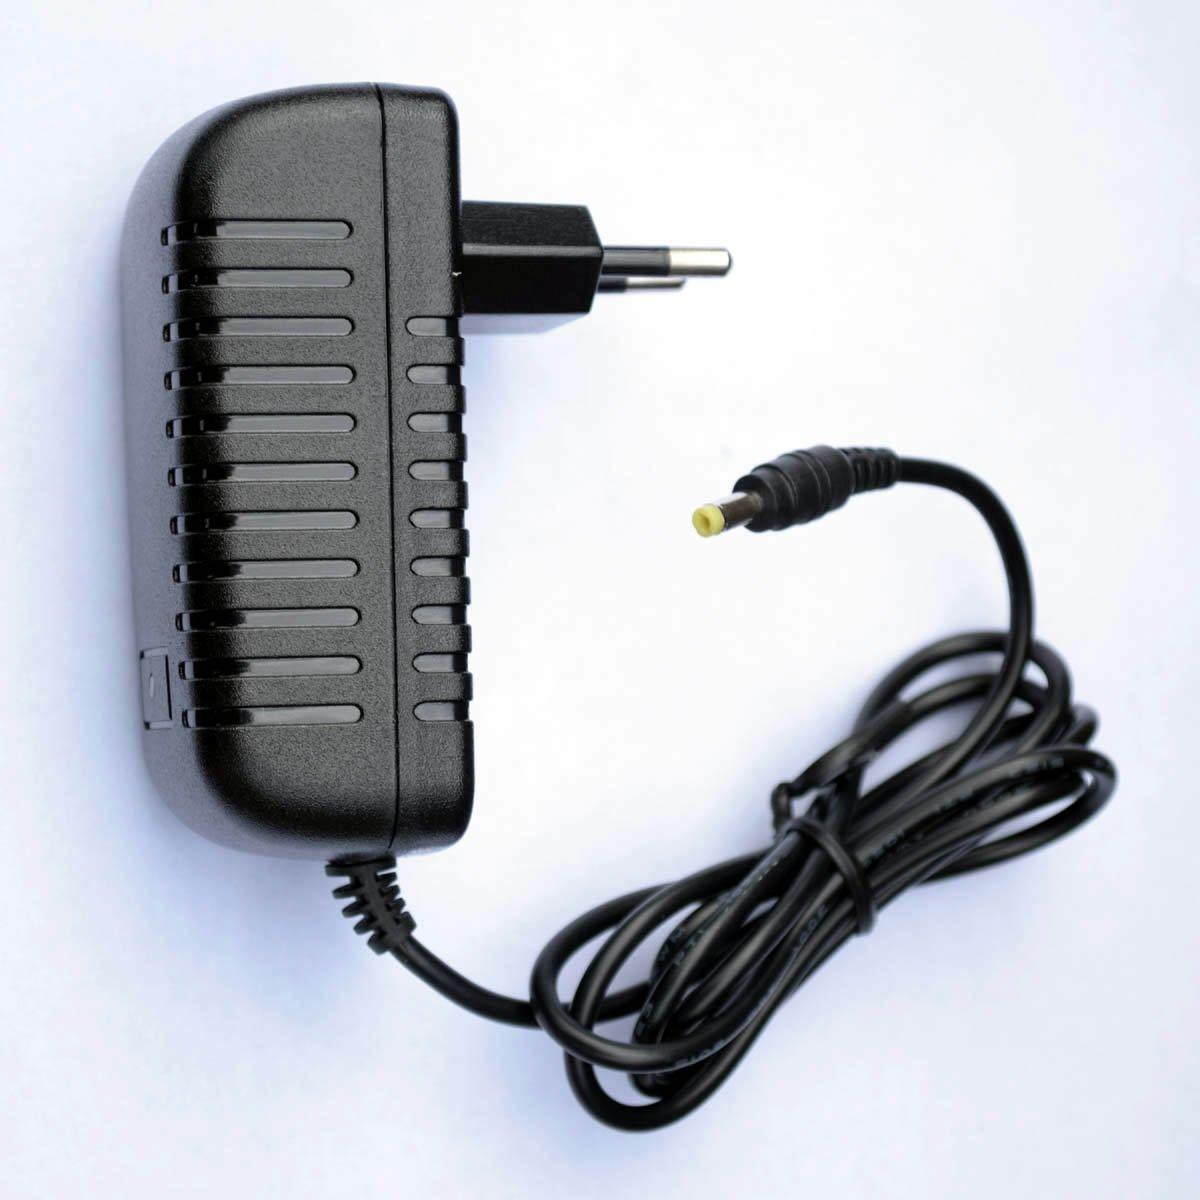 MyVolts 12V EU-Netzteil kompatibel mit Roli Seaboard Rise 49 MIDI Controller Premium